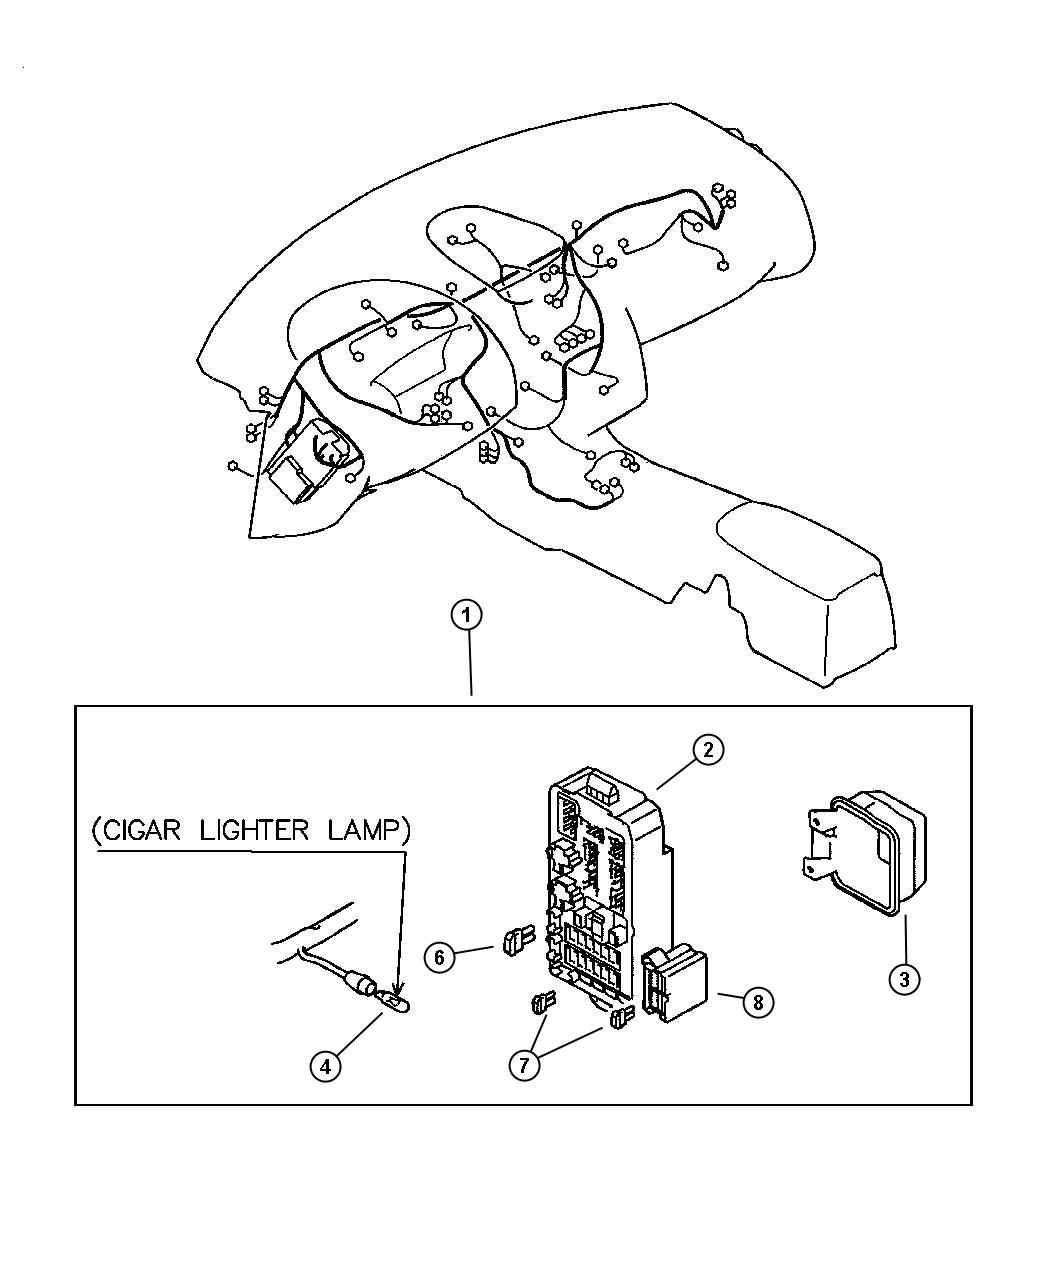 33 Chrysler Sebring Fuse Box Diagram